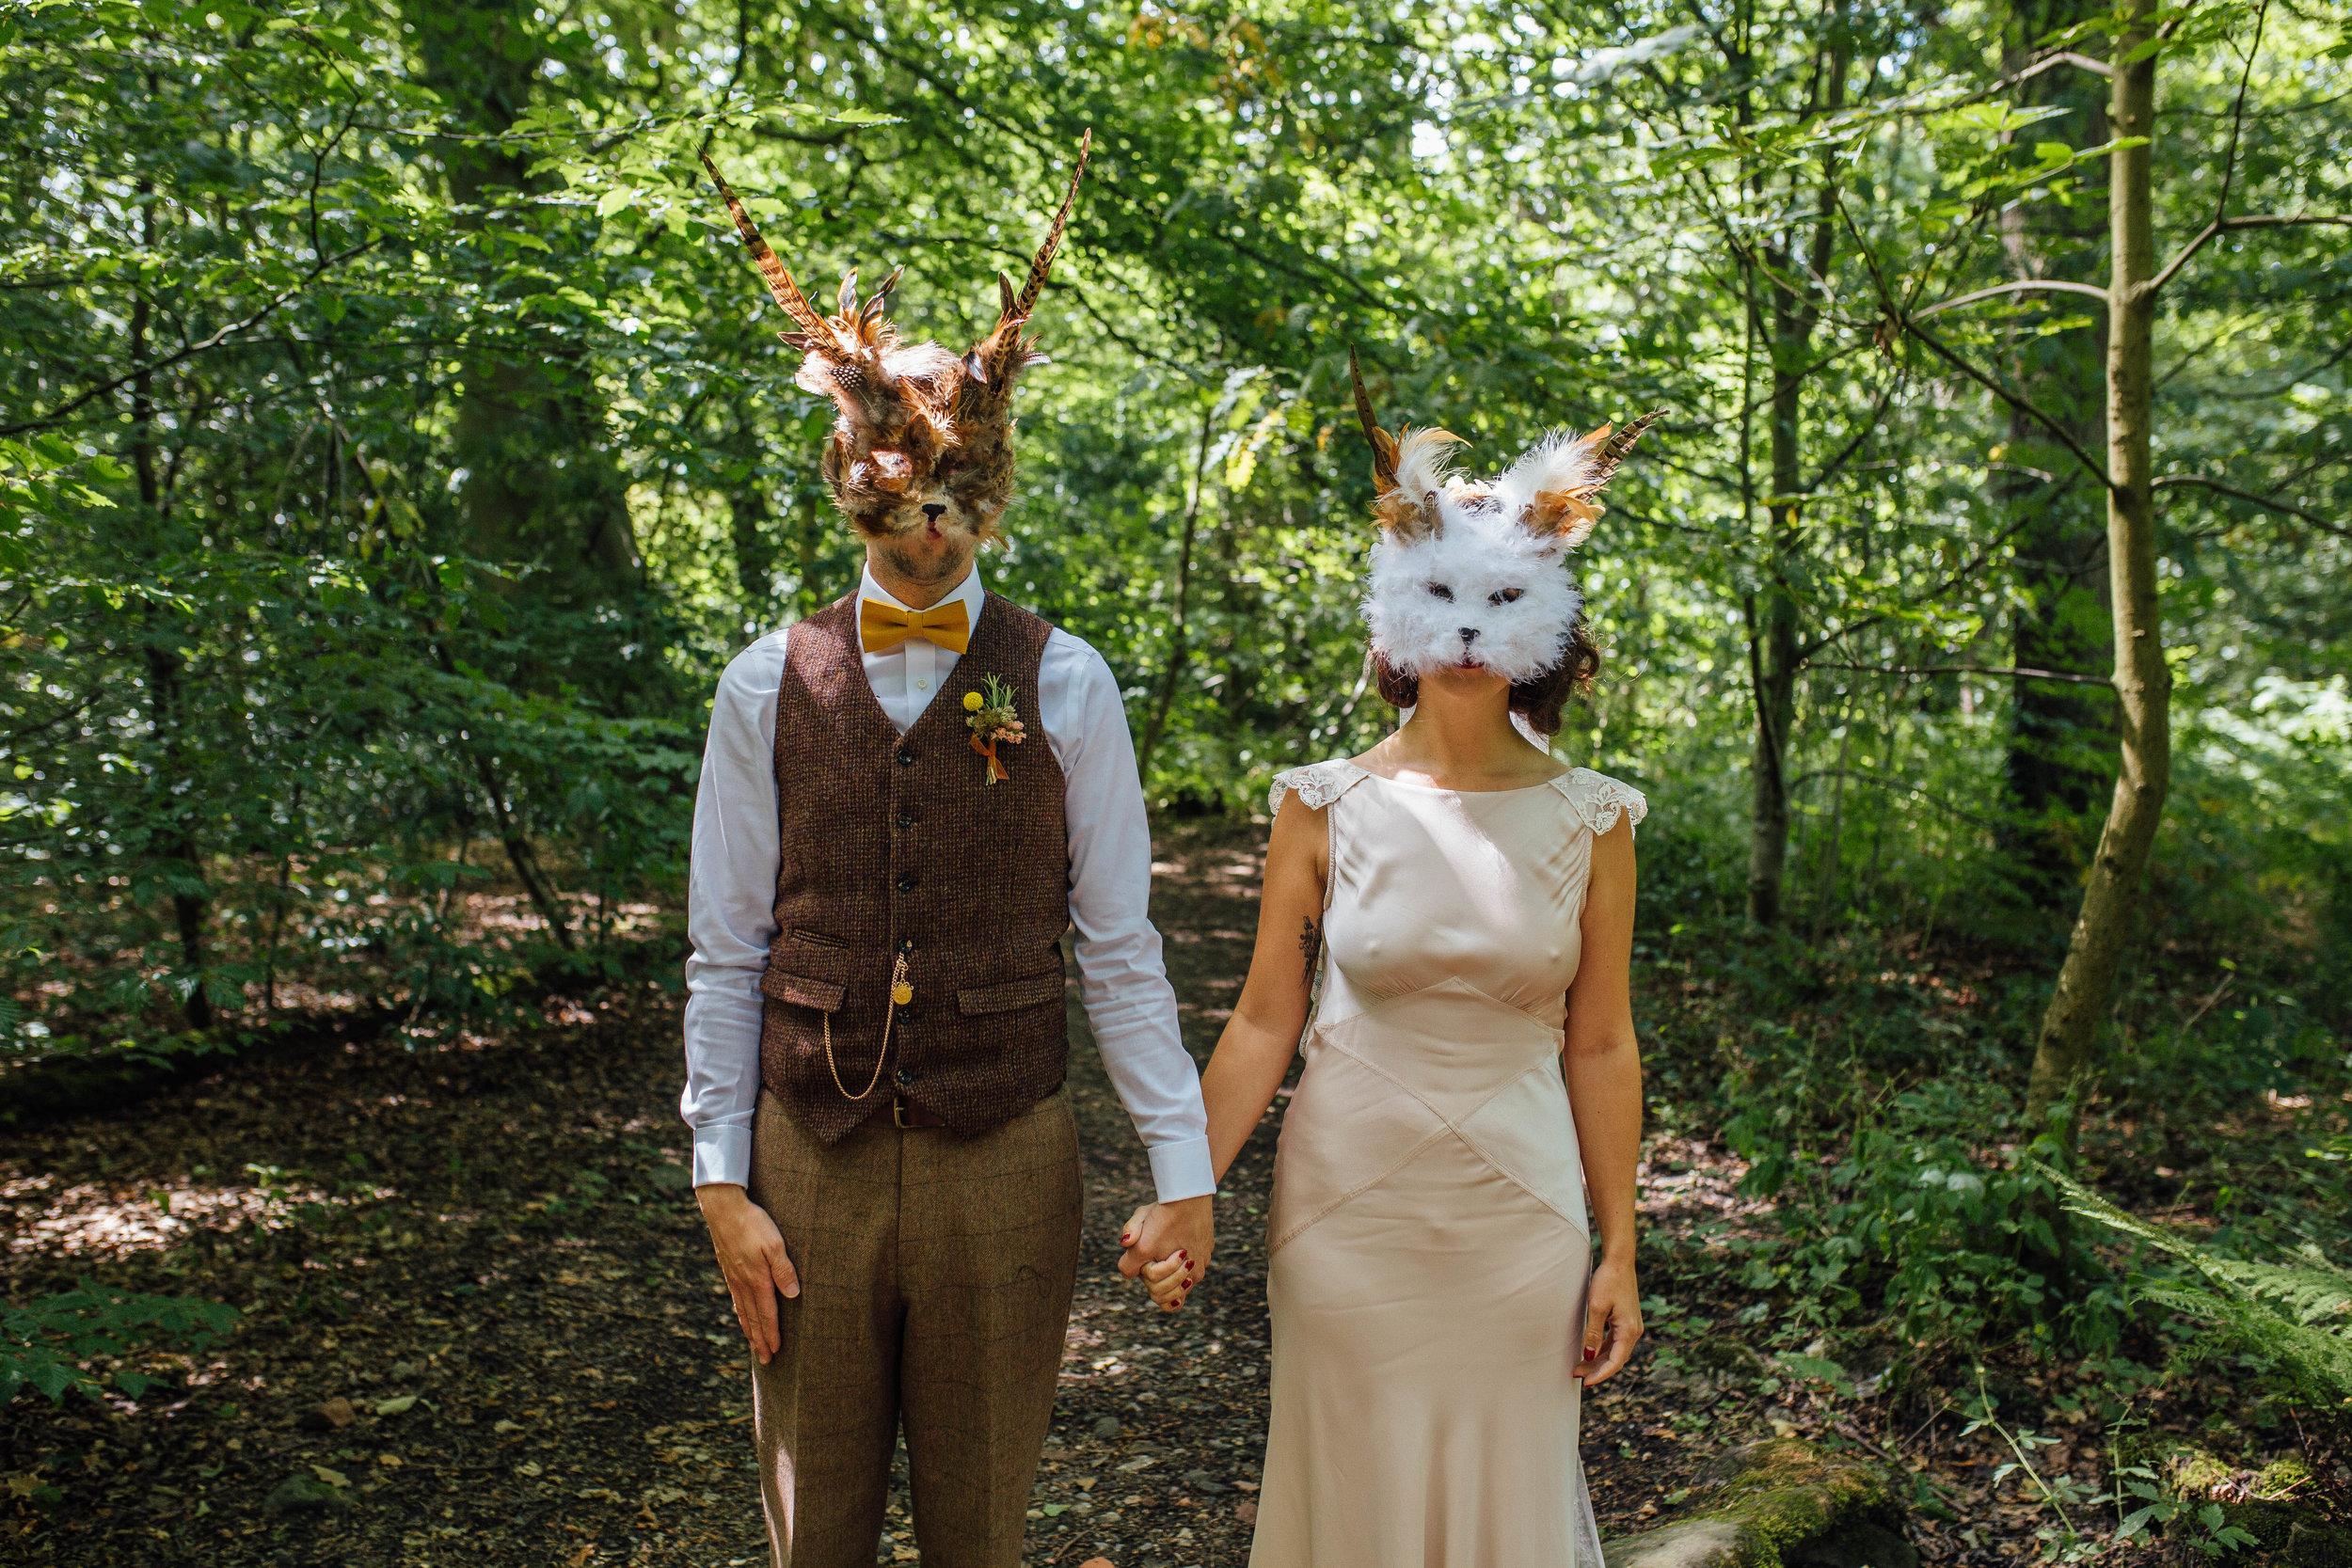 Sheffield Yorkshire Documentary Wedding Photographer Wes Anderson